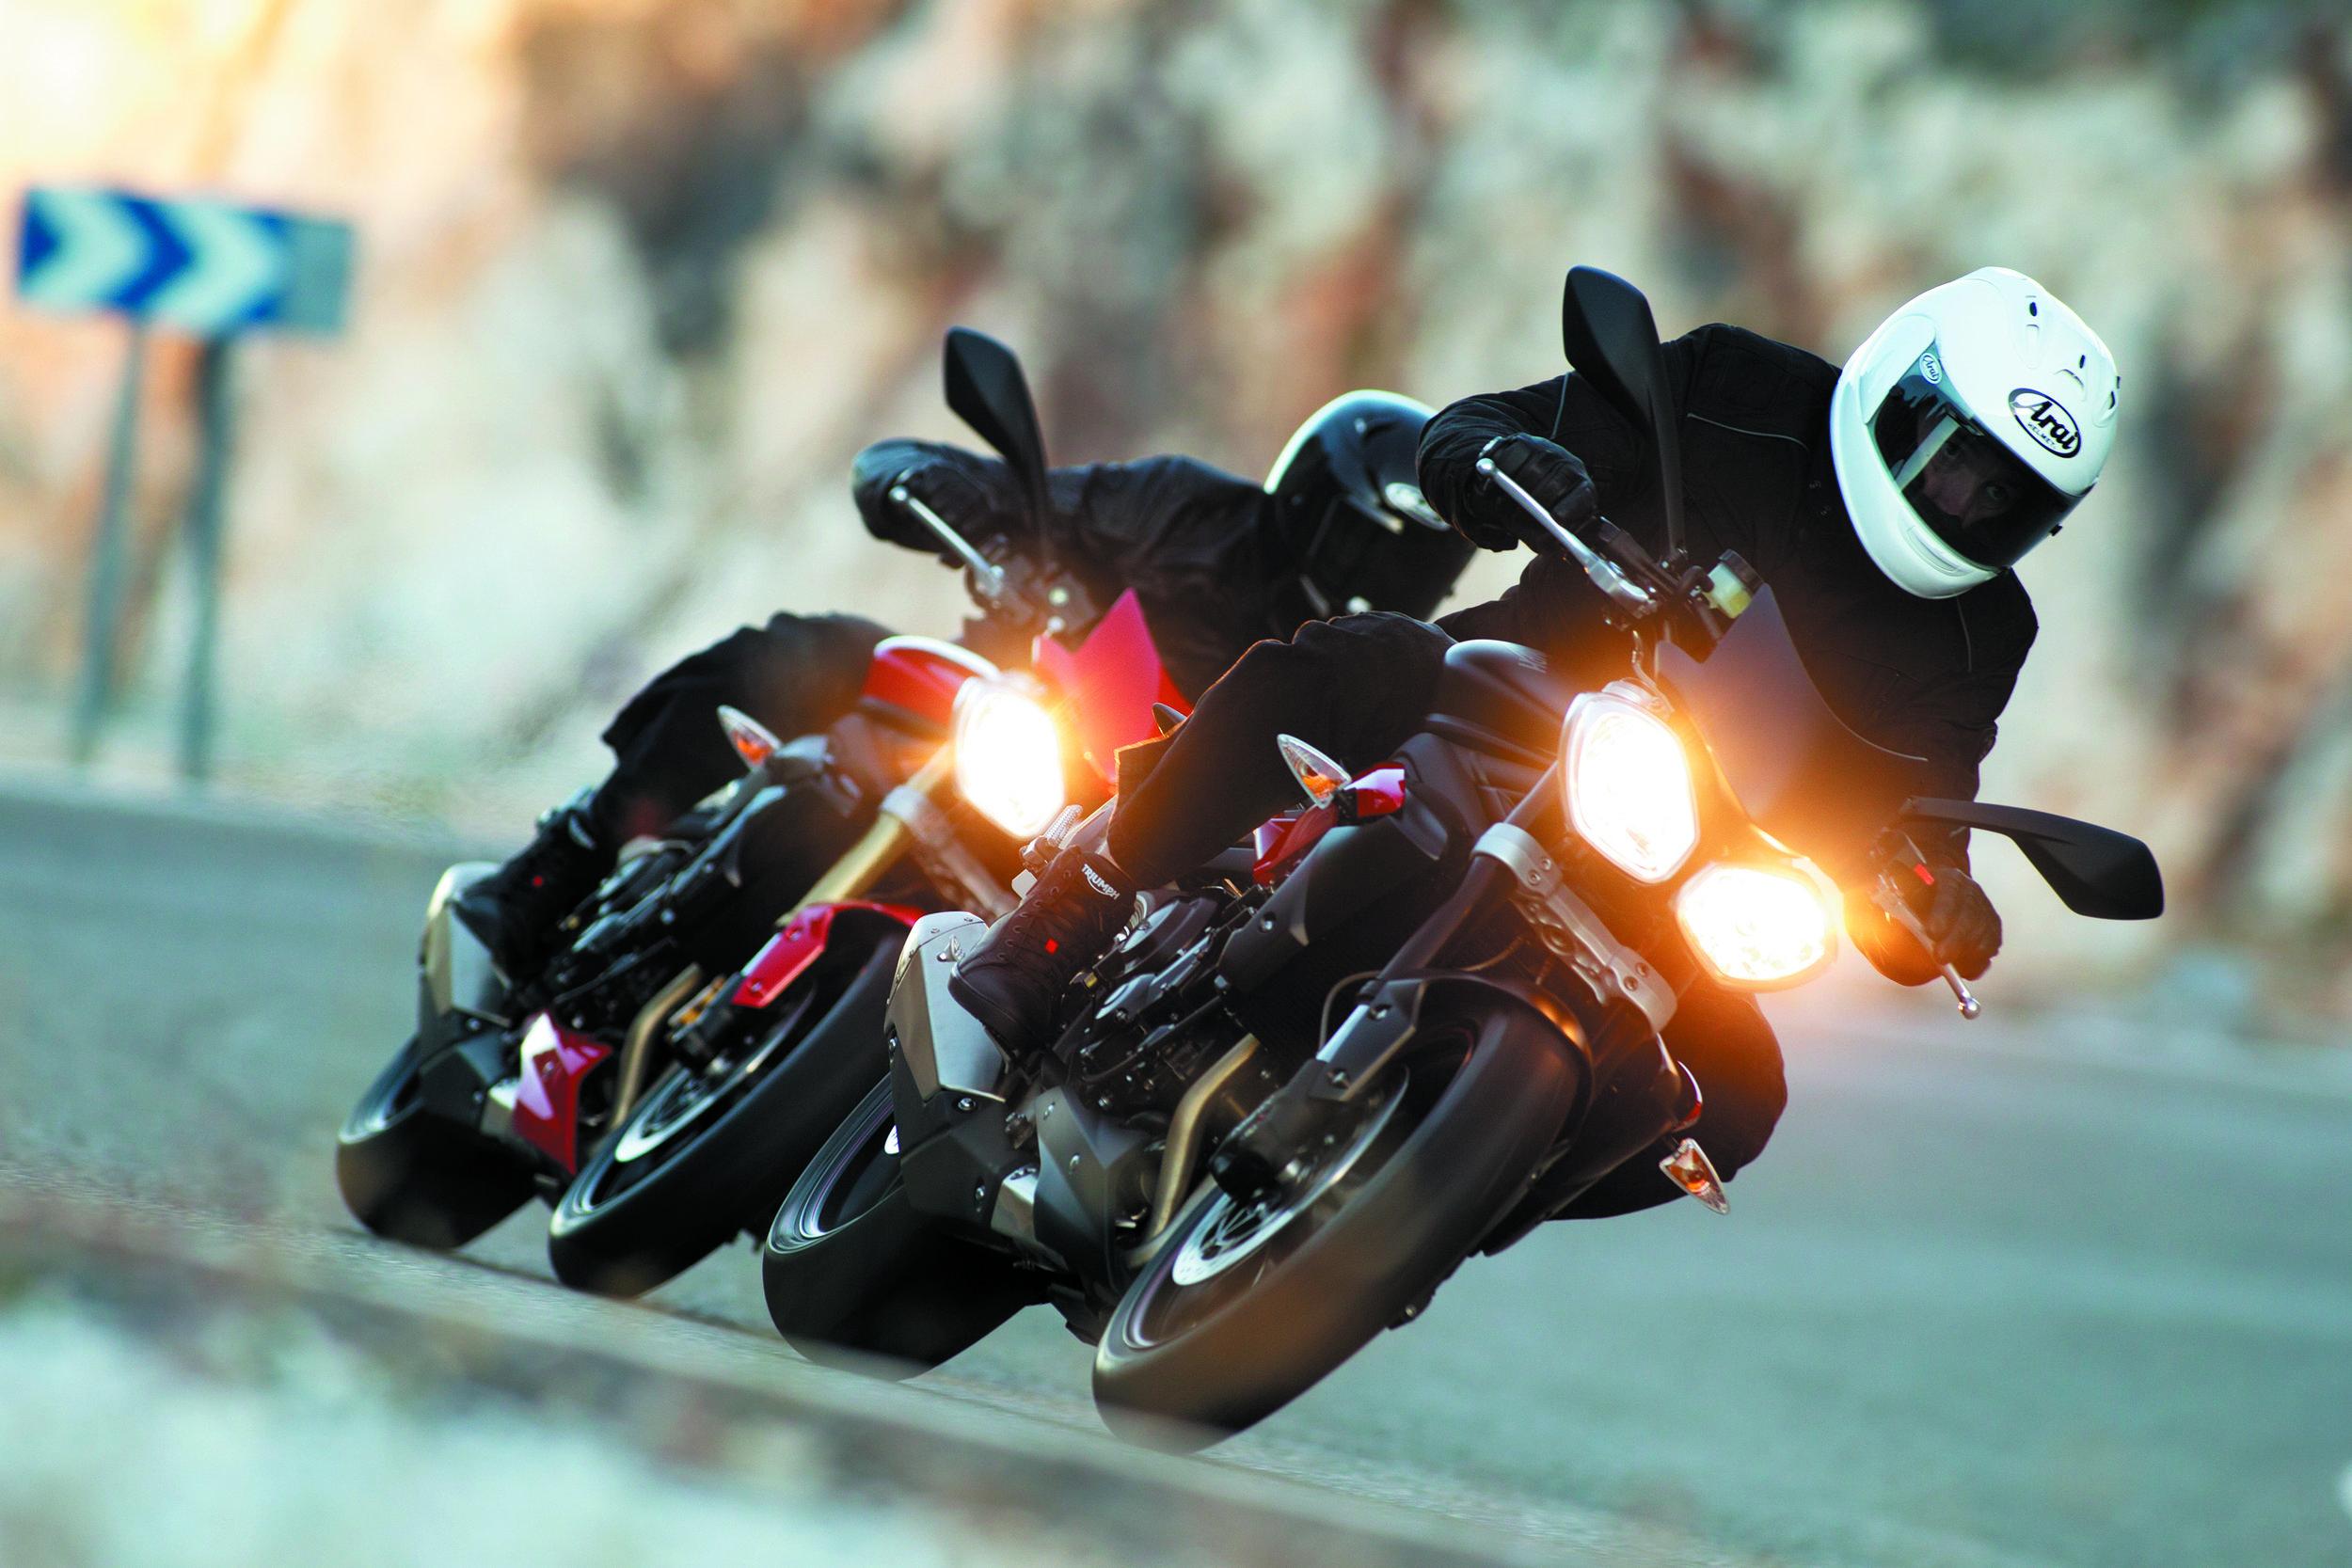 StreetTriple_Riding.jpg